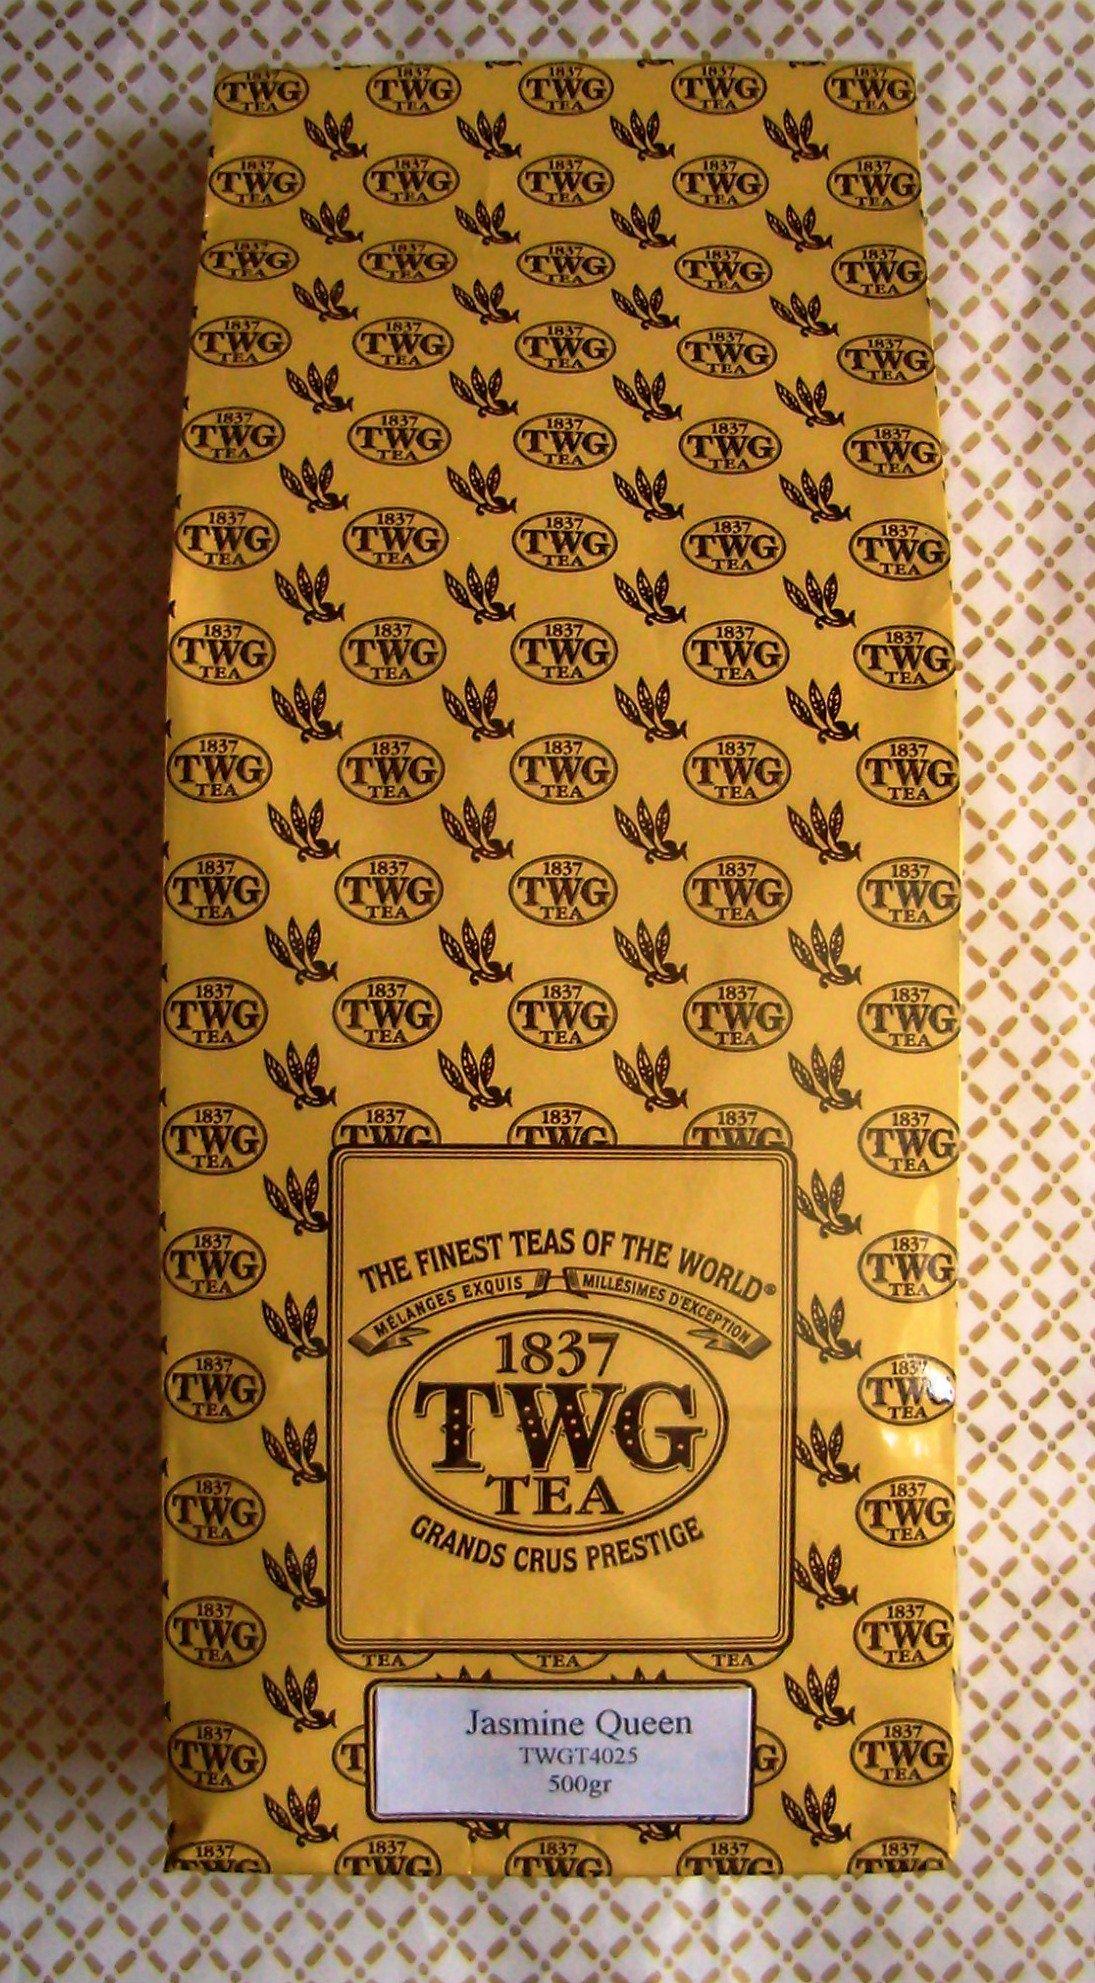 TWG Tea - Jasmine Queen Tea (TWGT4025) - 17.63oz / 500gr Loose Leaf BULK BAG by Unknown (Image #1)